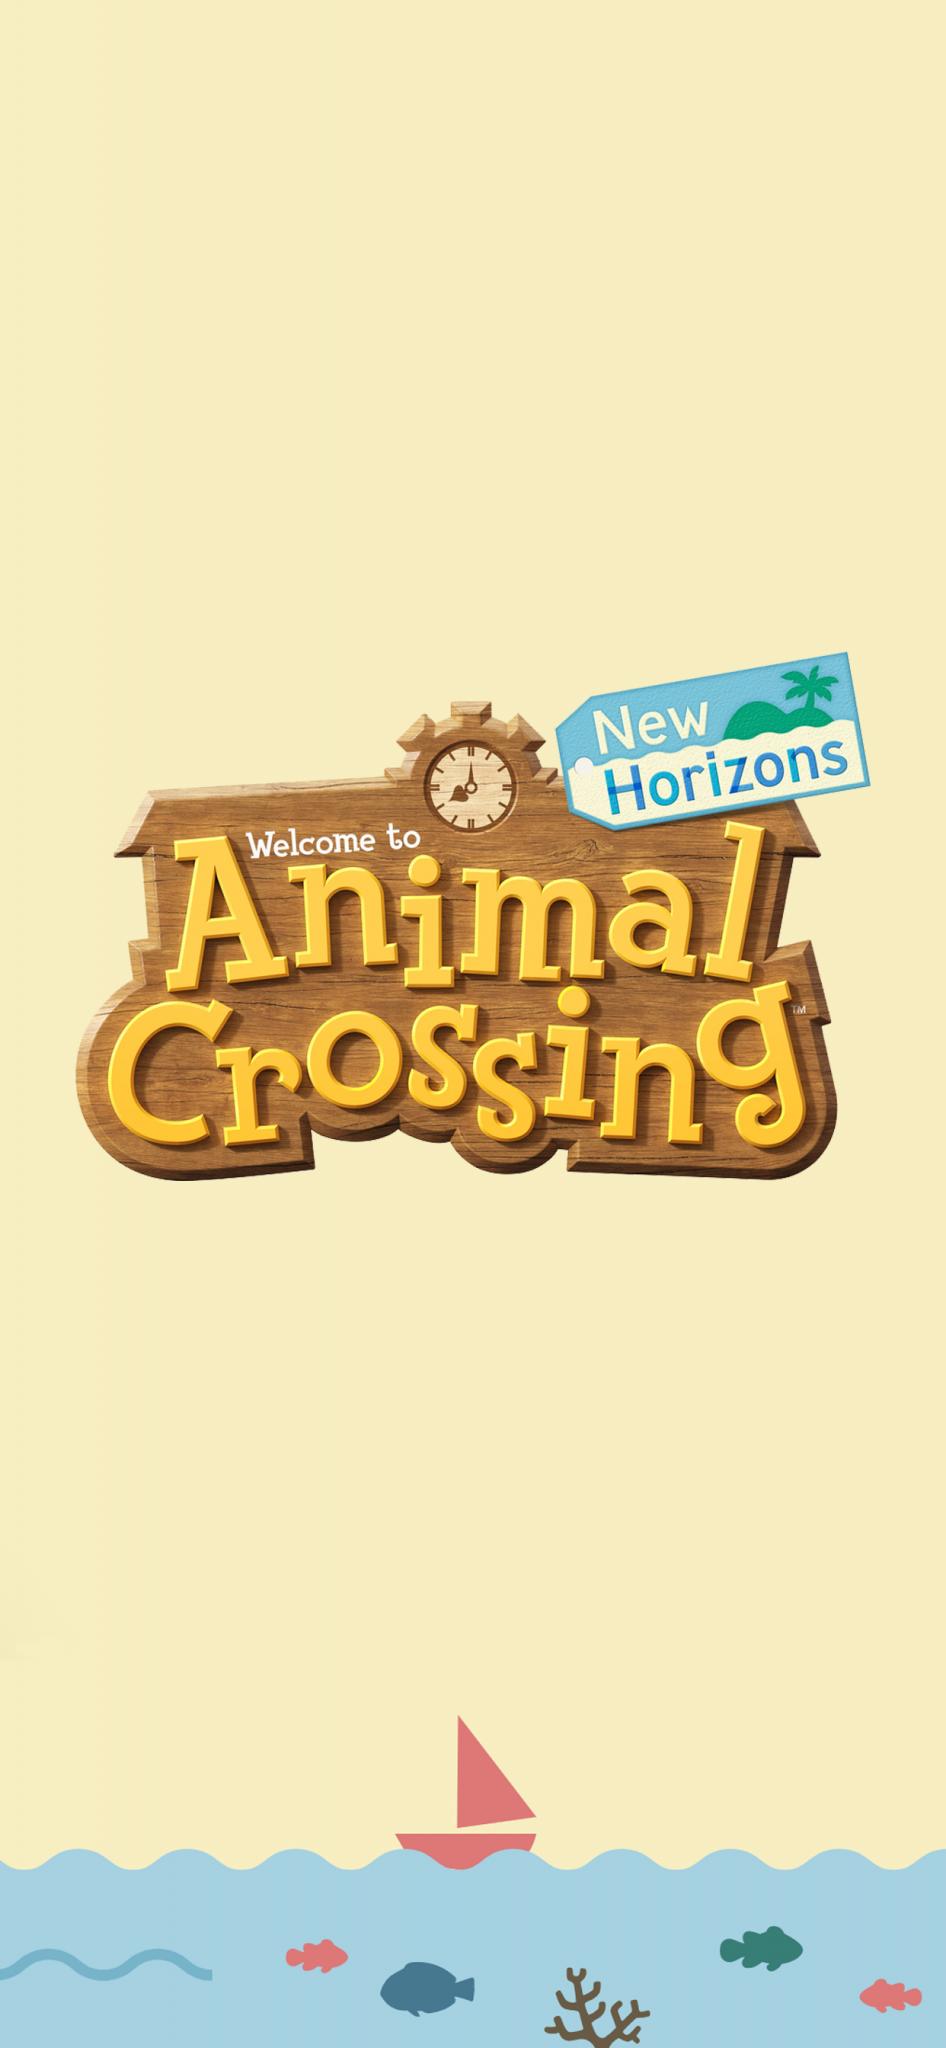 Pin on Animal Crossing in 2020 Animal crossing, Desktop